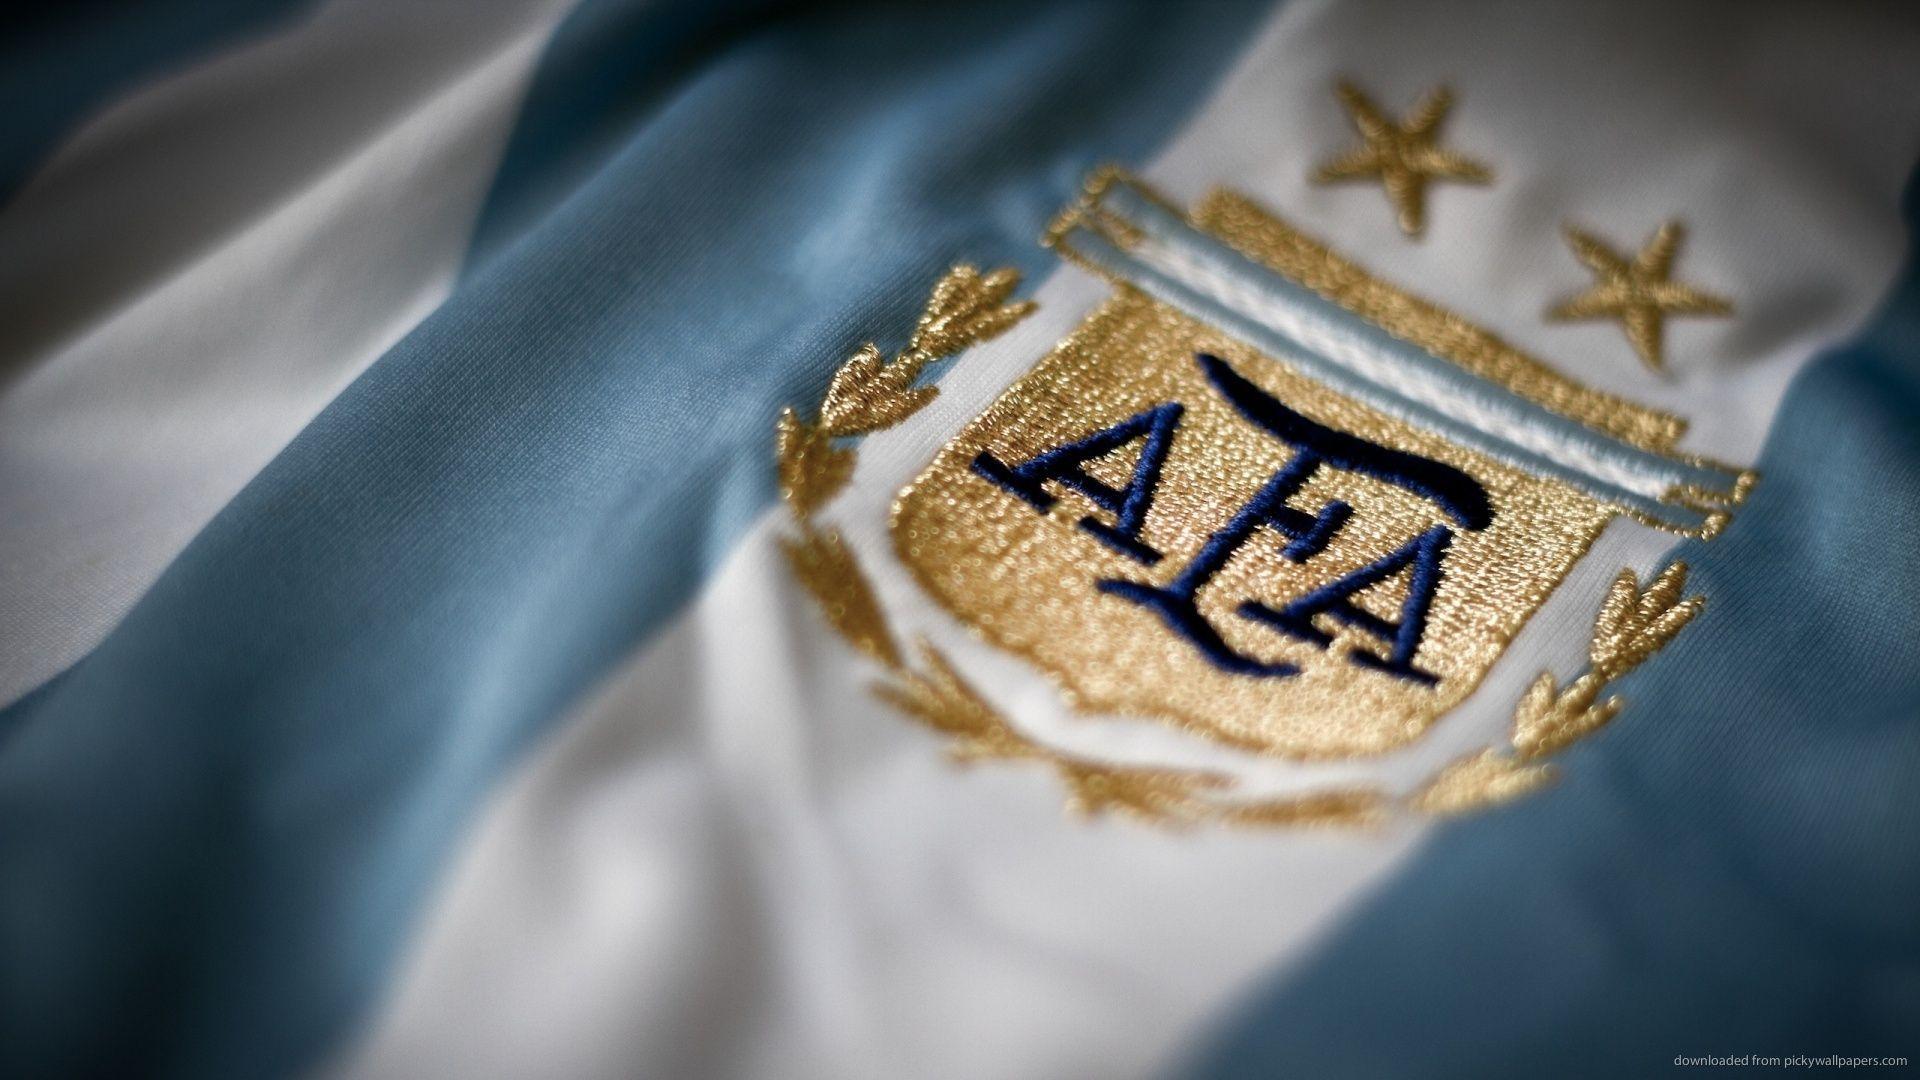 Argentina Wallpapers Hd Desktop Backgrounds Images And Pictures 1920 1080 Argentina Wallpapers 4 Football Team Logos Football Ticket National Football Teams